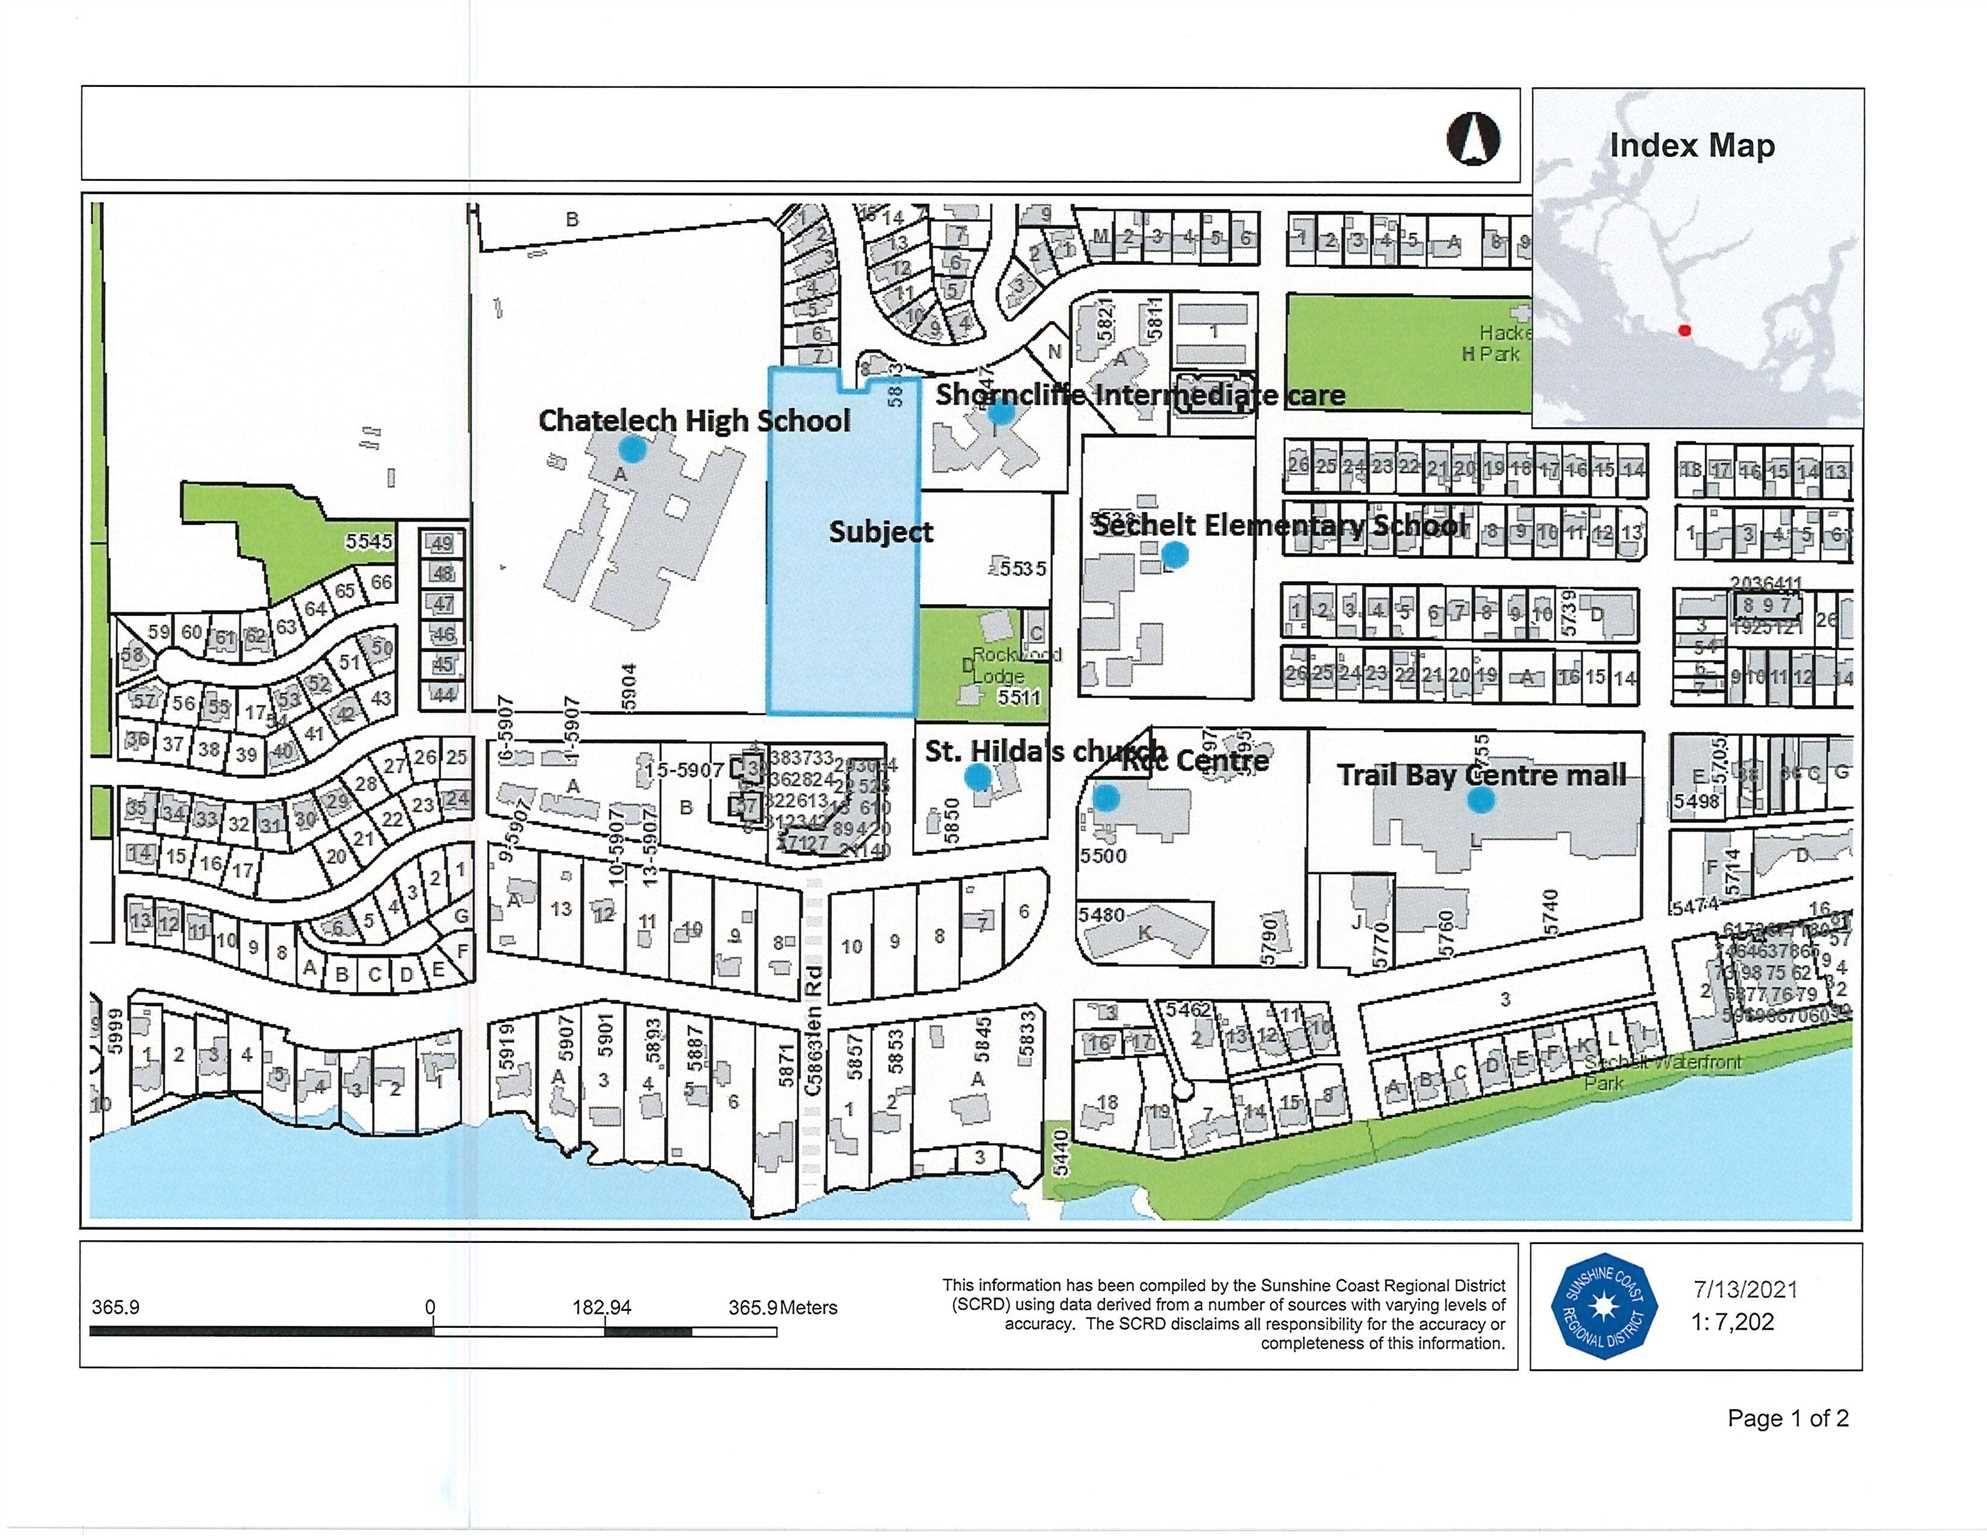 Main Photo: PARCEL A COWRIE Street in Sechelt: Sechelt District Land for sale (Sunshine Coast)  : MLS®# R2601572